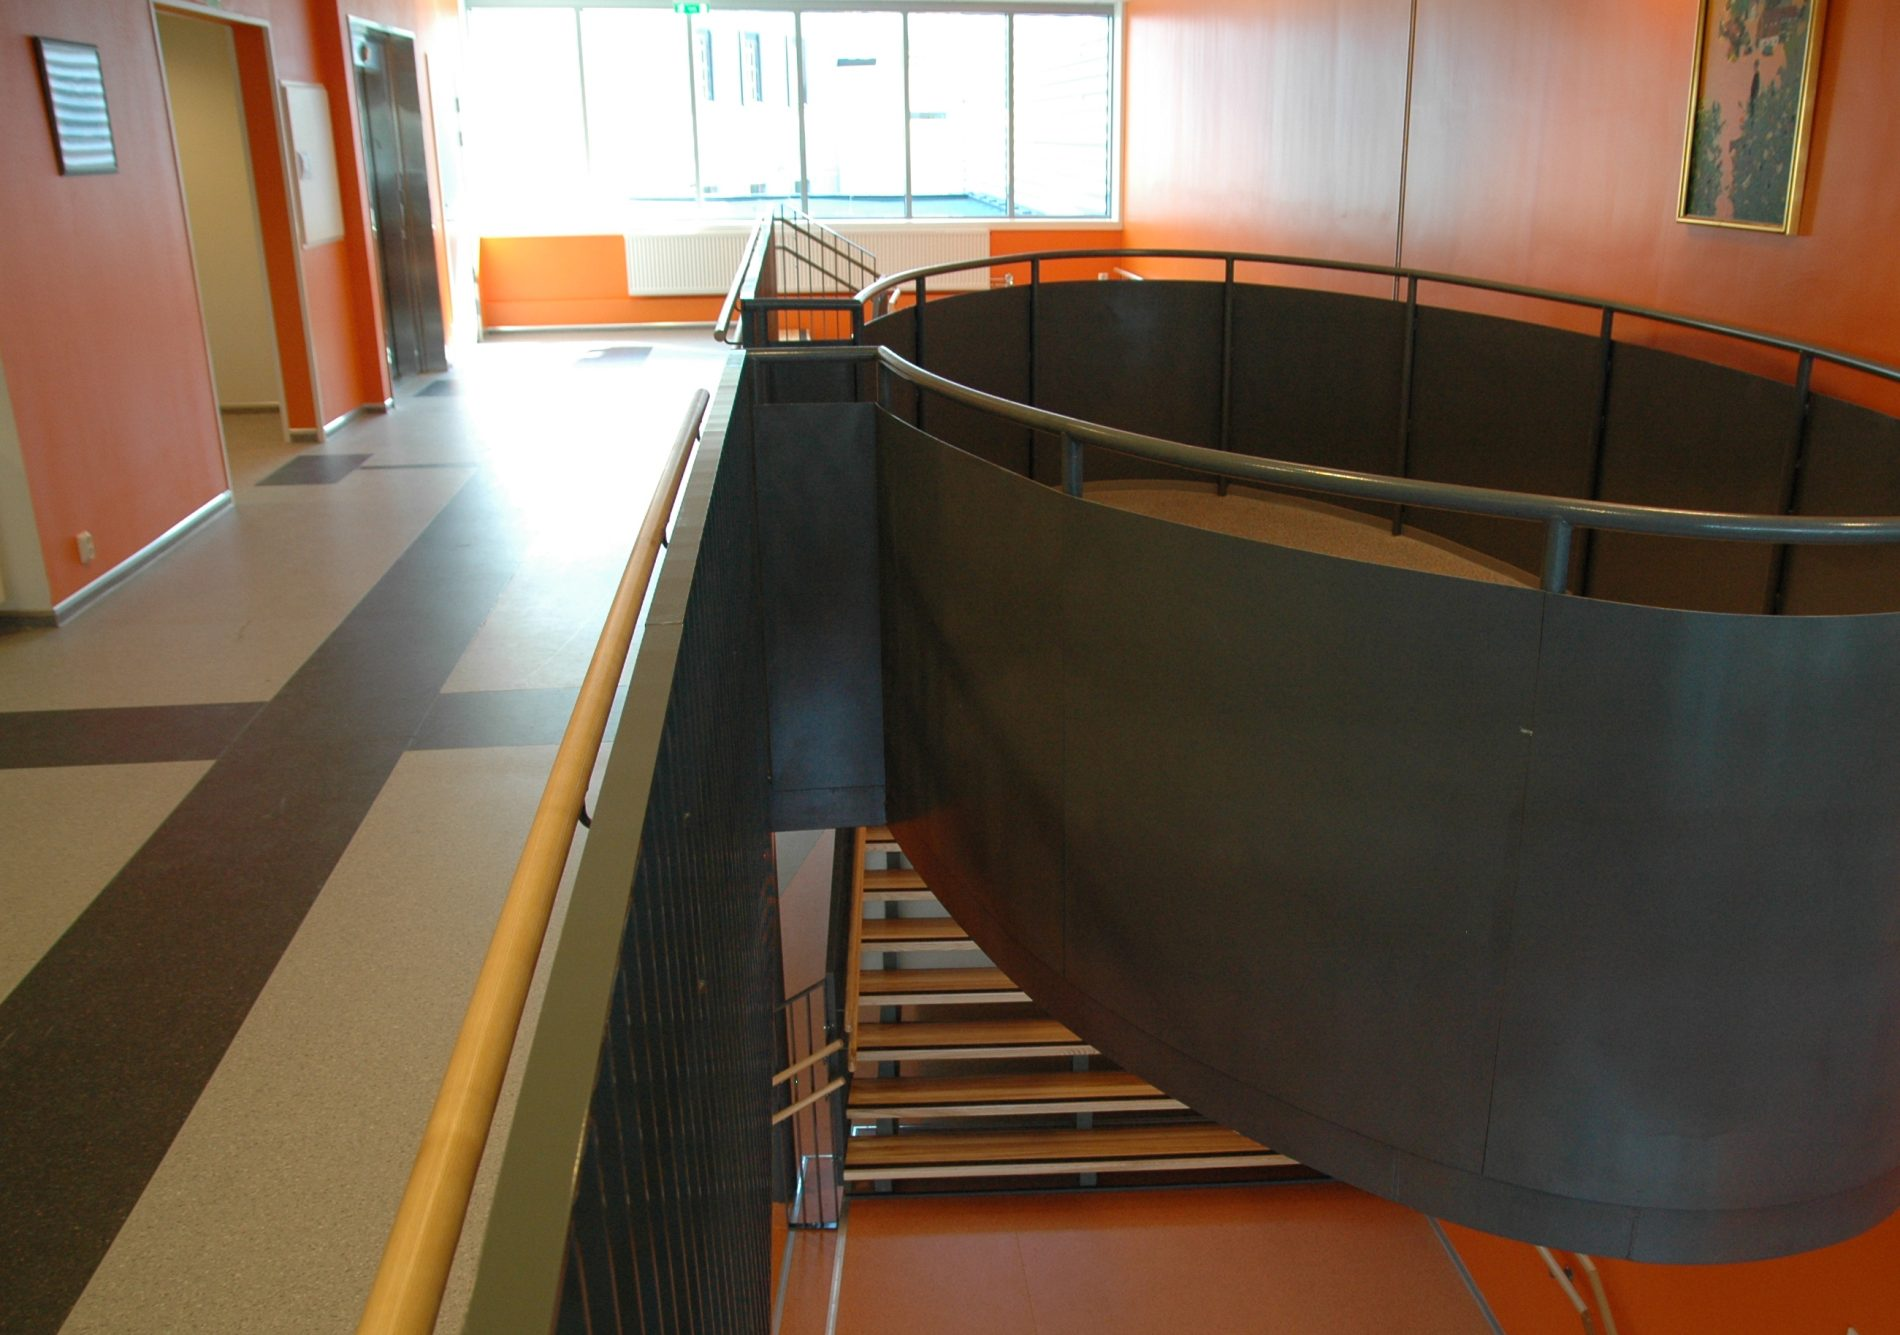 Notodden videregående skole - Point Design